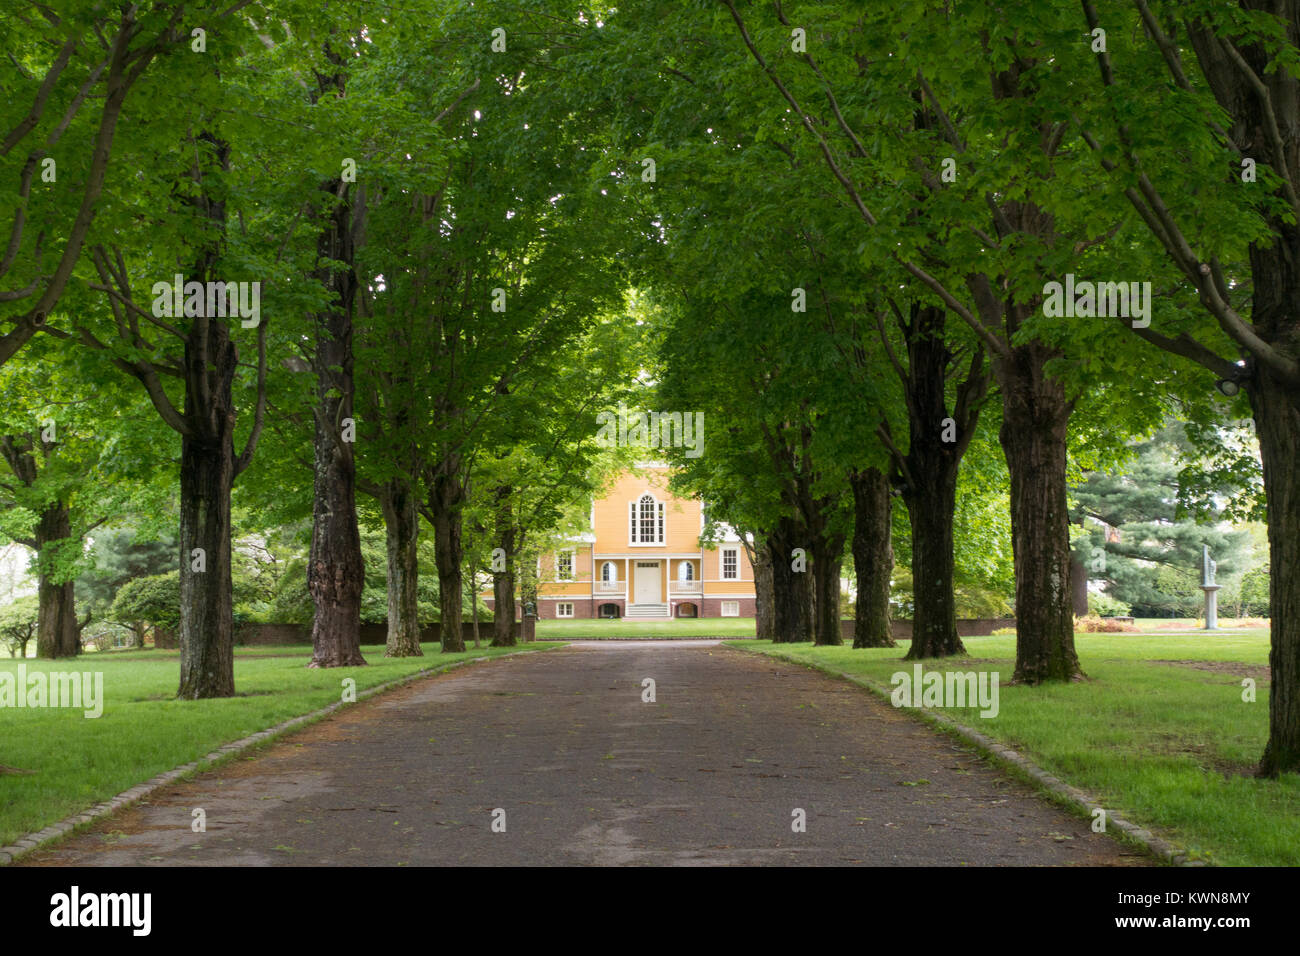 Boscobel house and gardens Garrison NY Stock Photo: 170727563 - Alamy